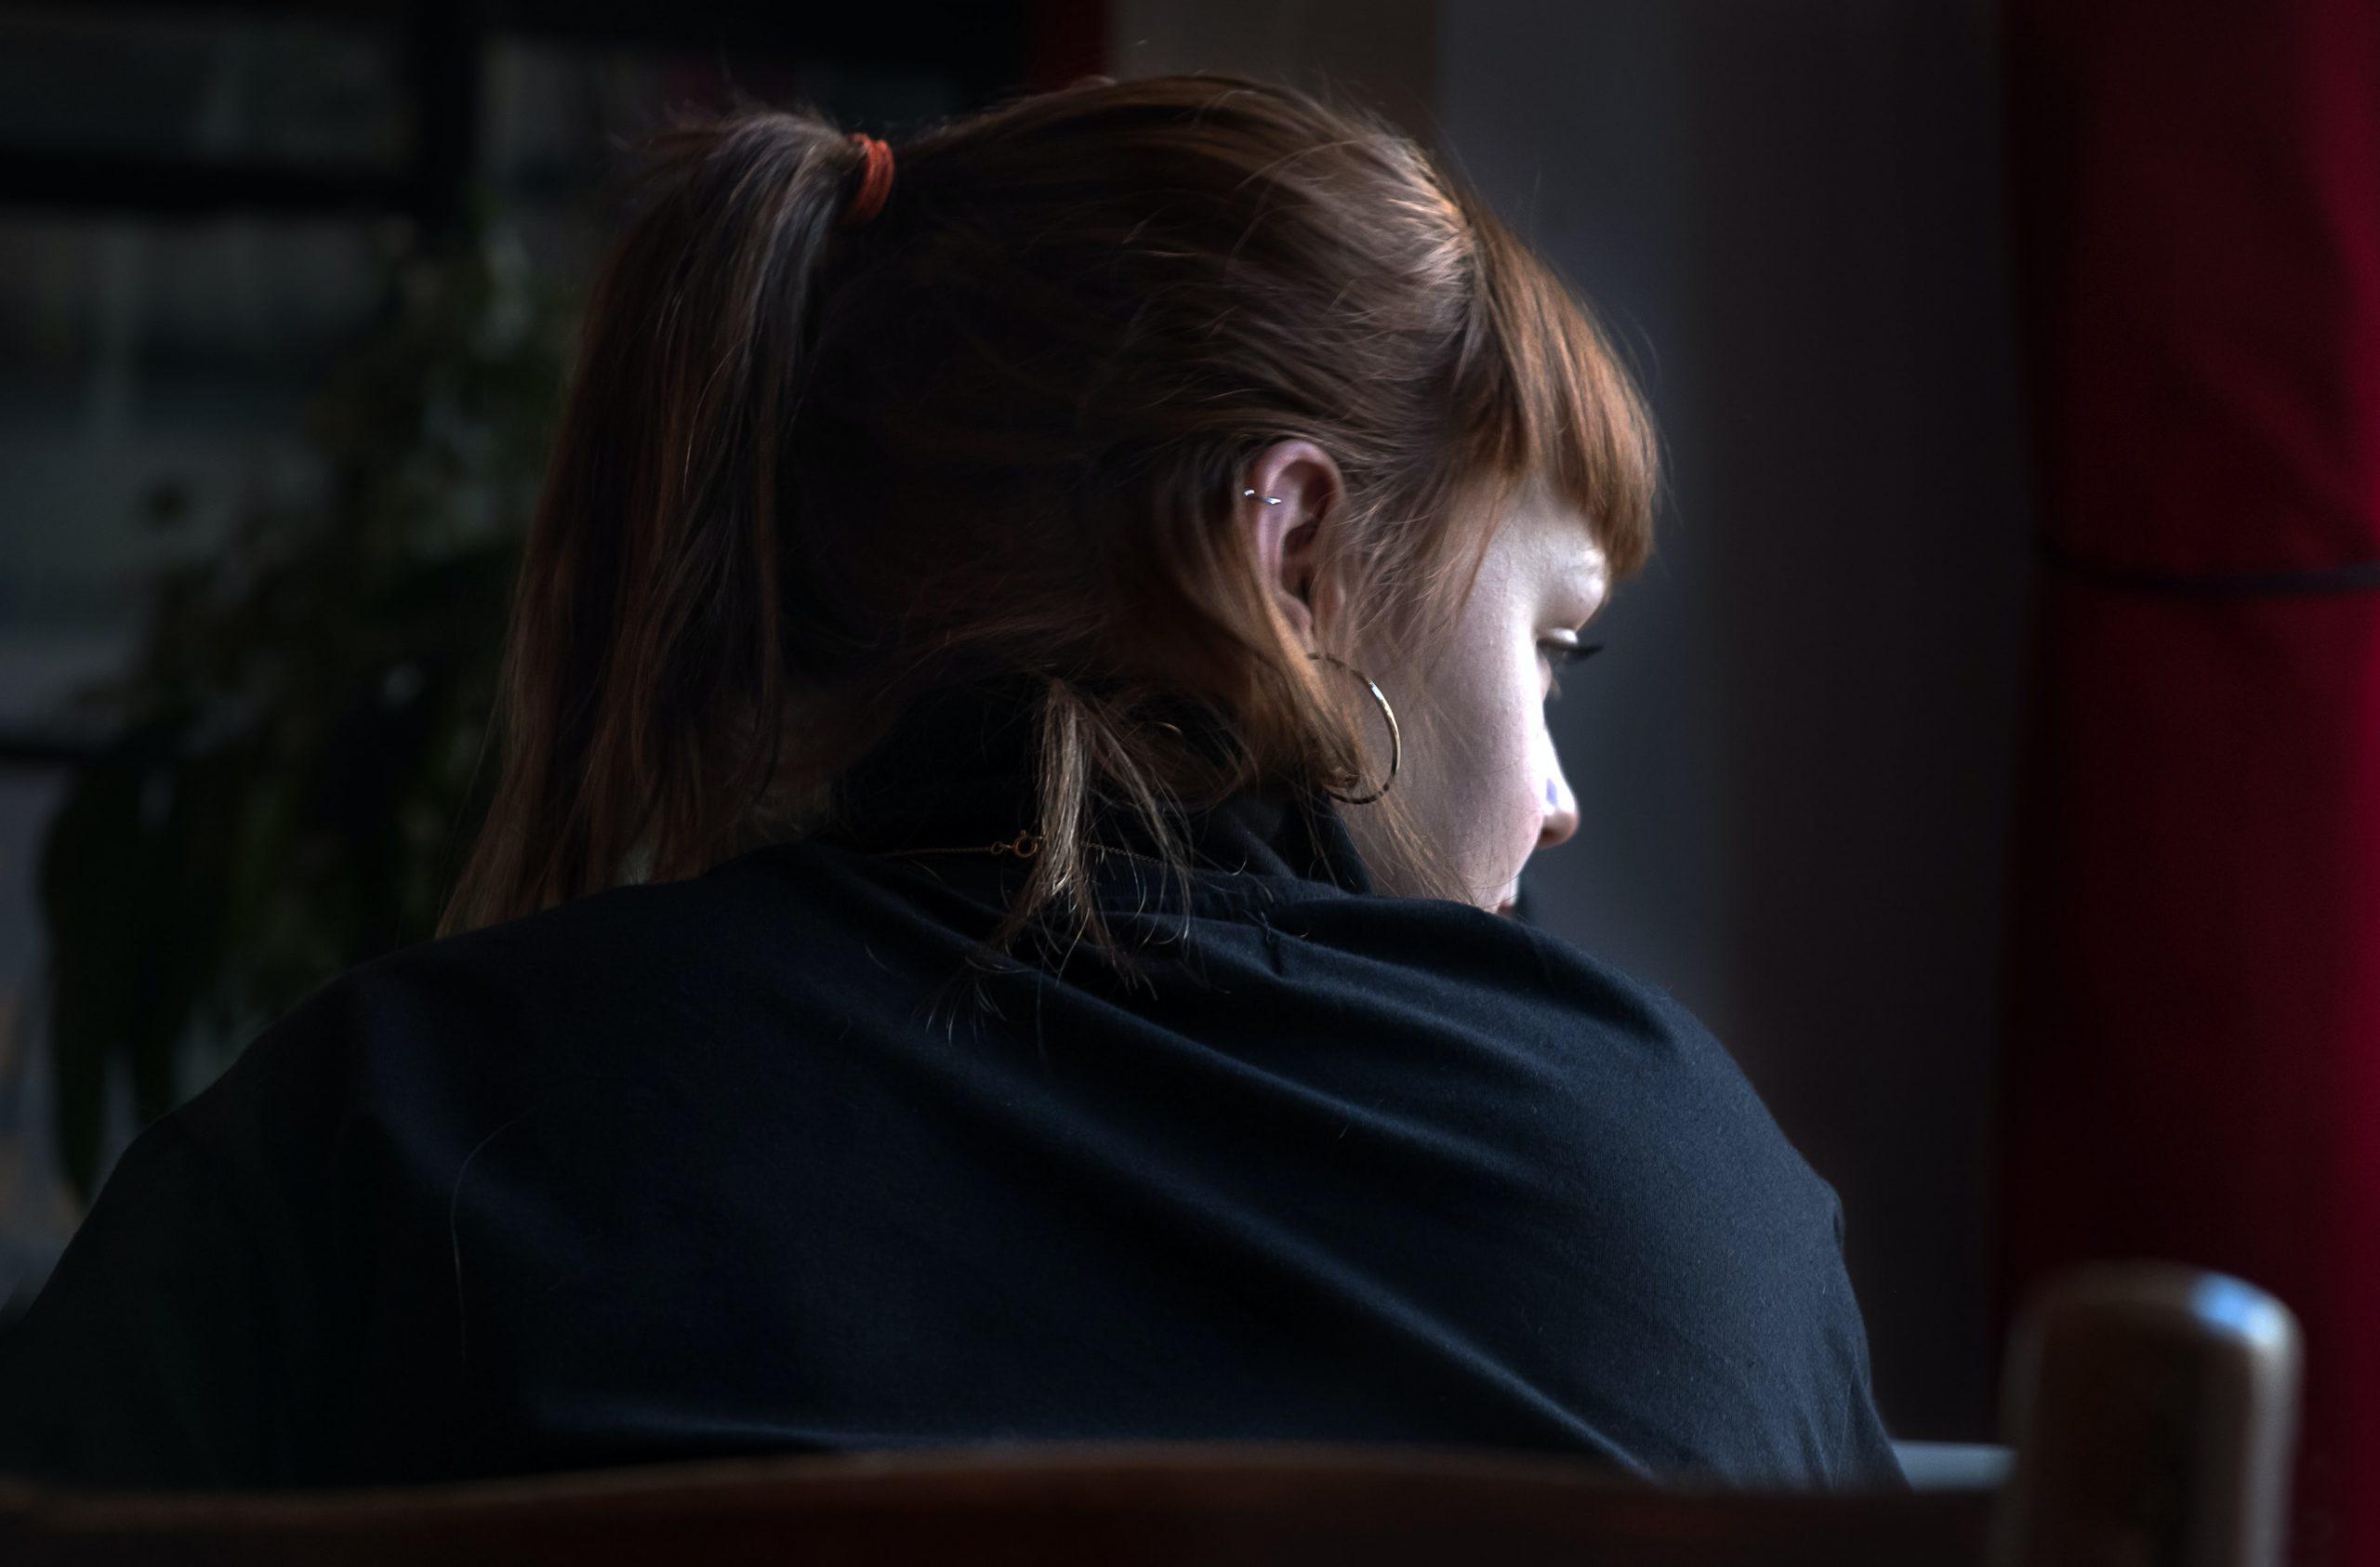 stalking mental health impacts dr ronan mcivor